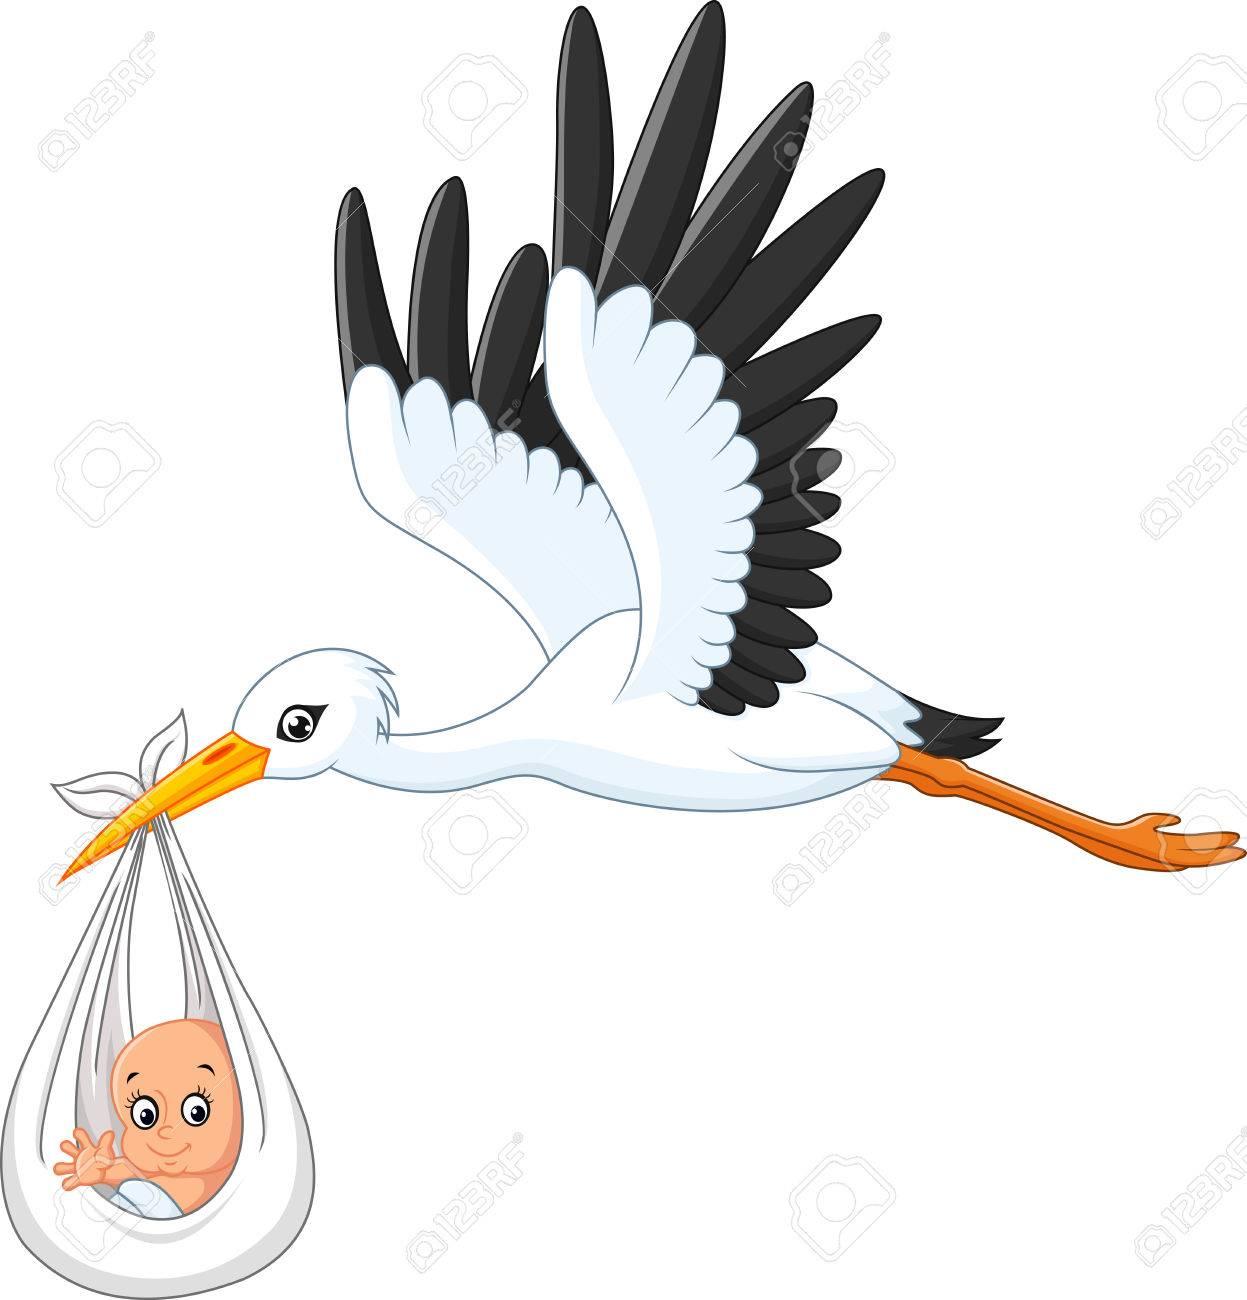 Cartoon stork carrying baby - 56878219